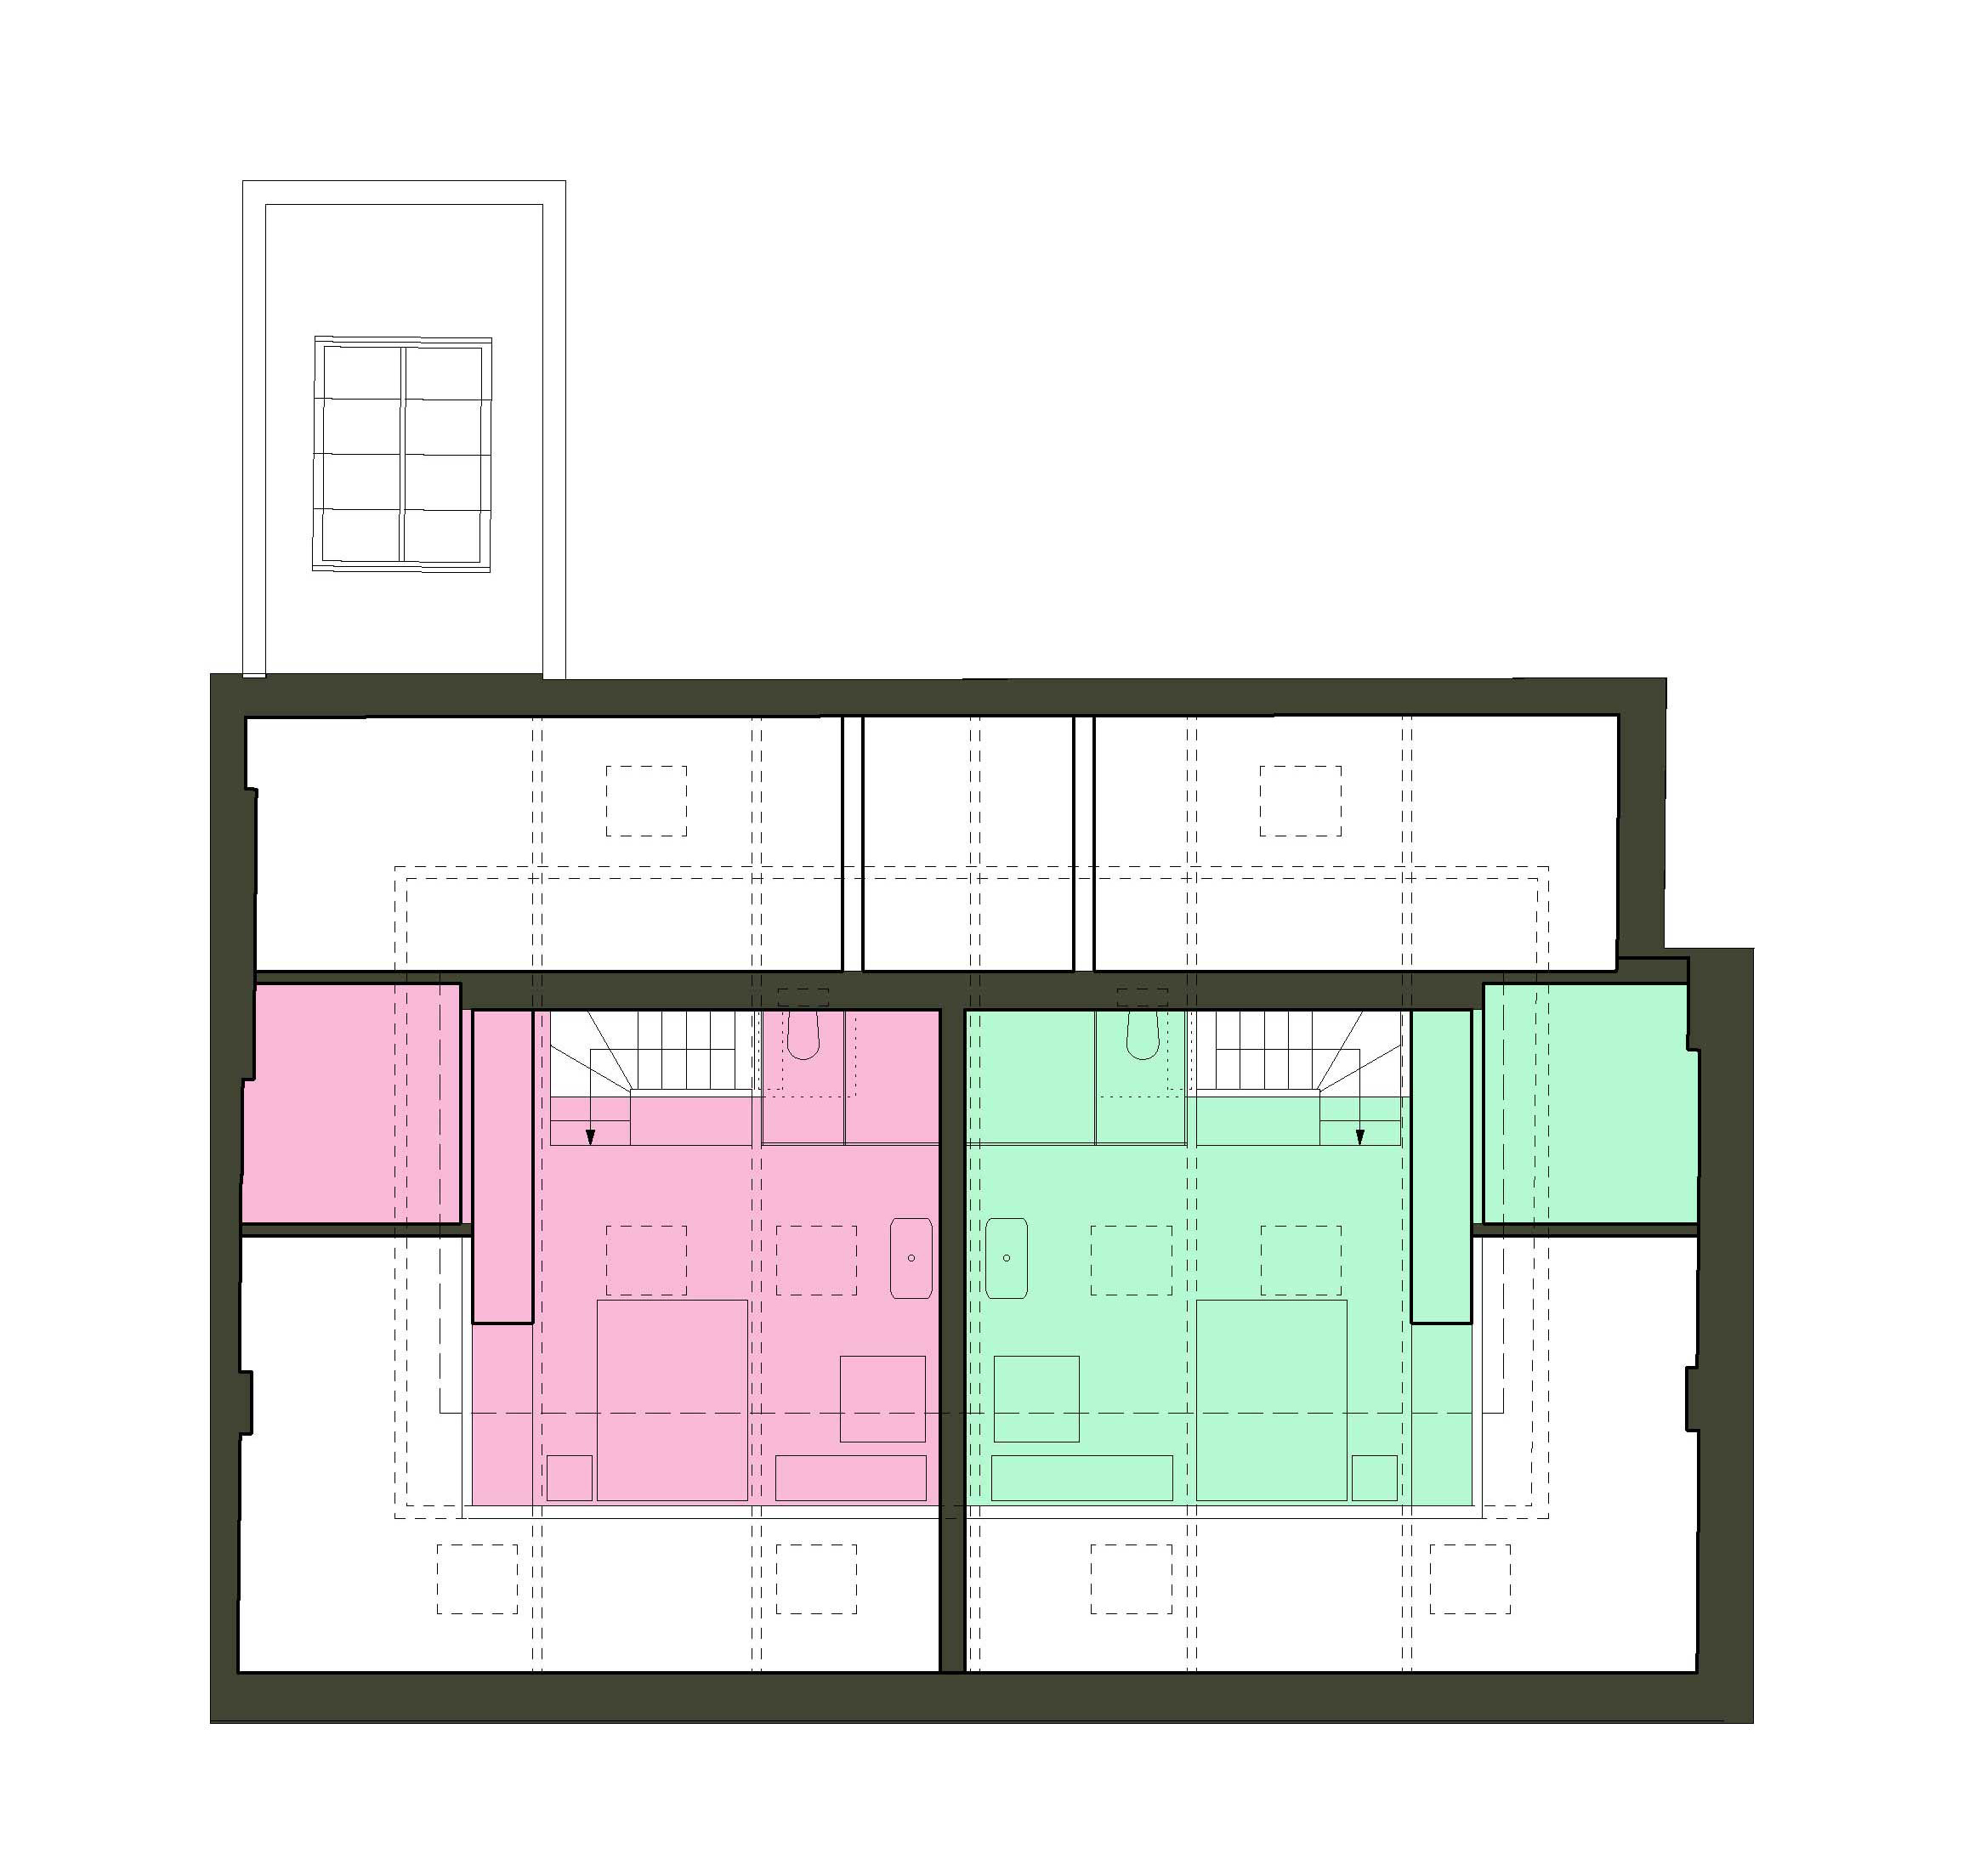 proposed third floor plan